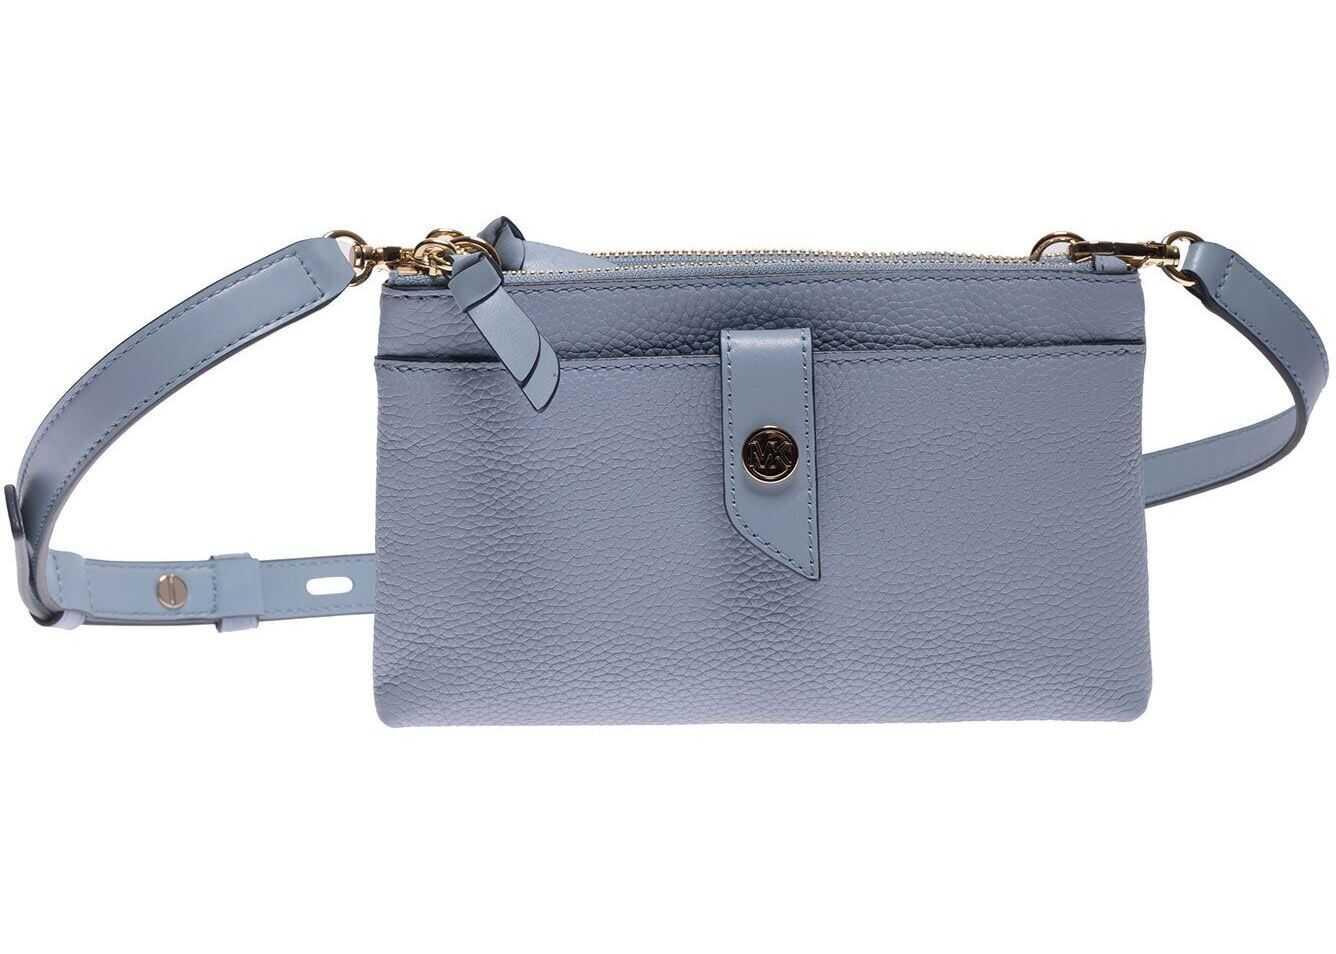 Michael Kors Mk Charm Shoulder Bag In Pale Blue 32S0G00C2L PALE BLU Light Blue imagine b-mall.ro